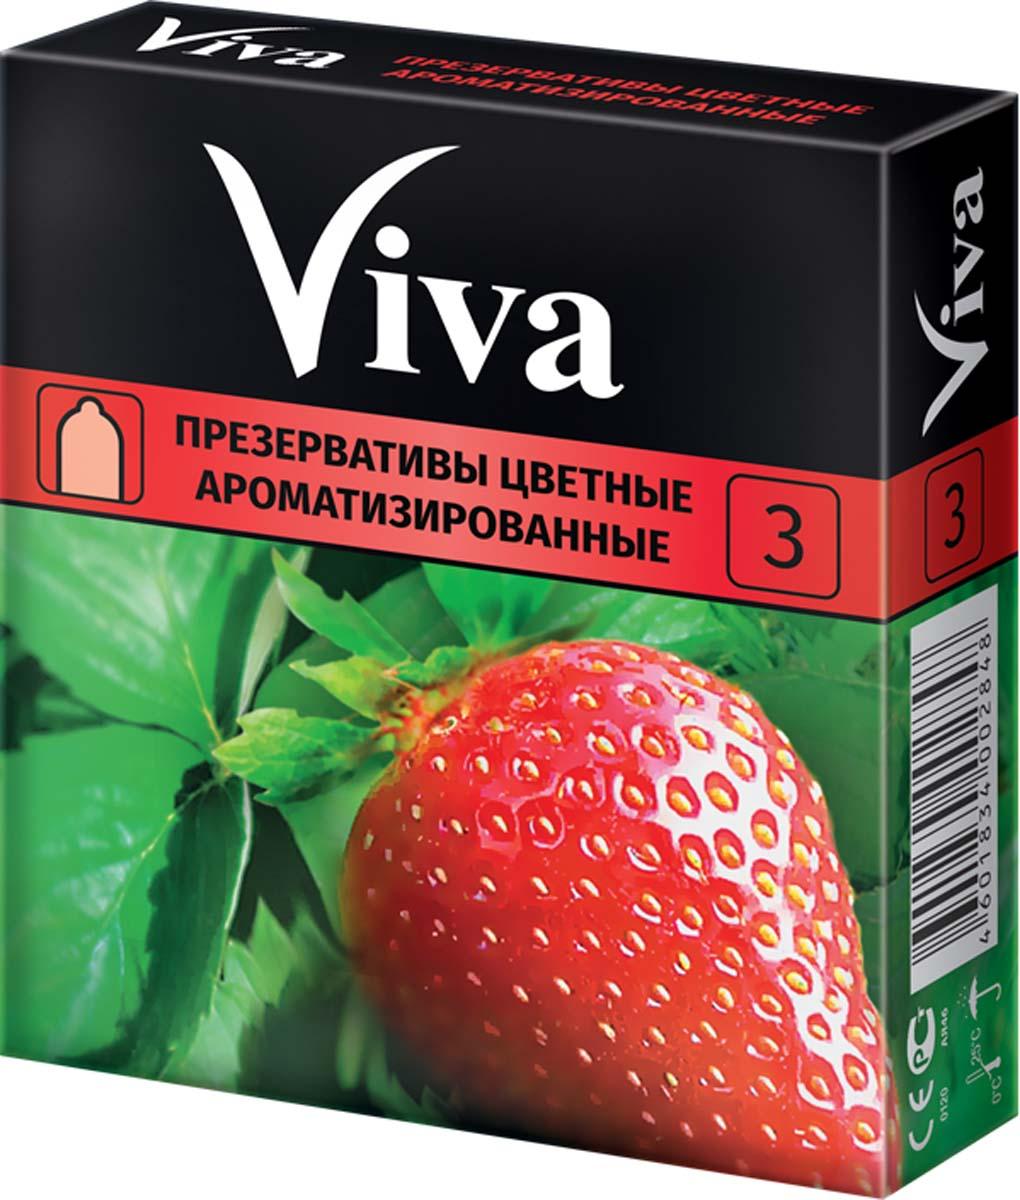 VIVA Презервативы Цветные ароматизированные, 3 шт likemei презервативы тонкие 8 шт